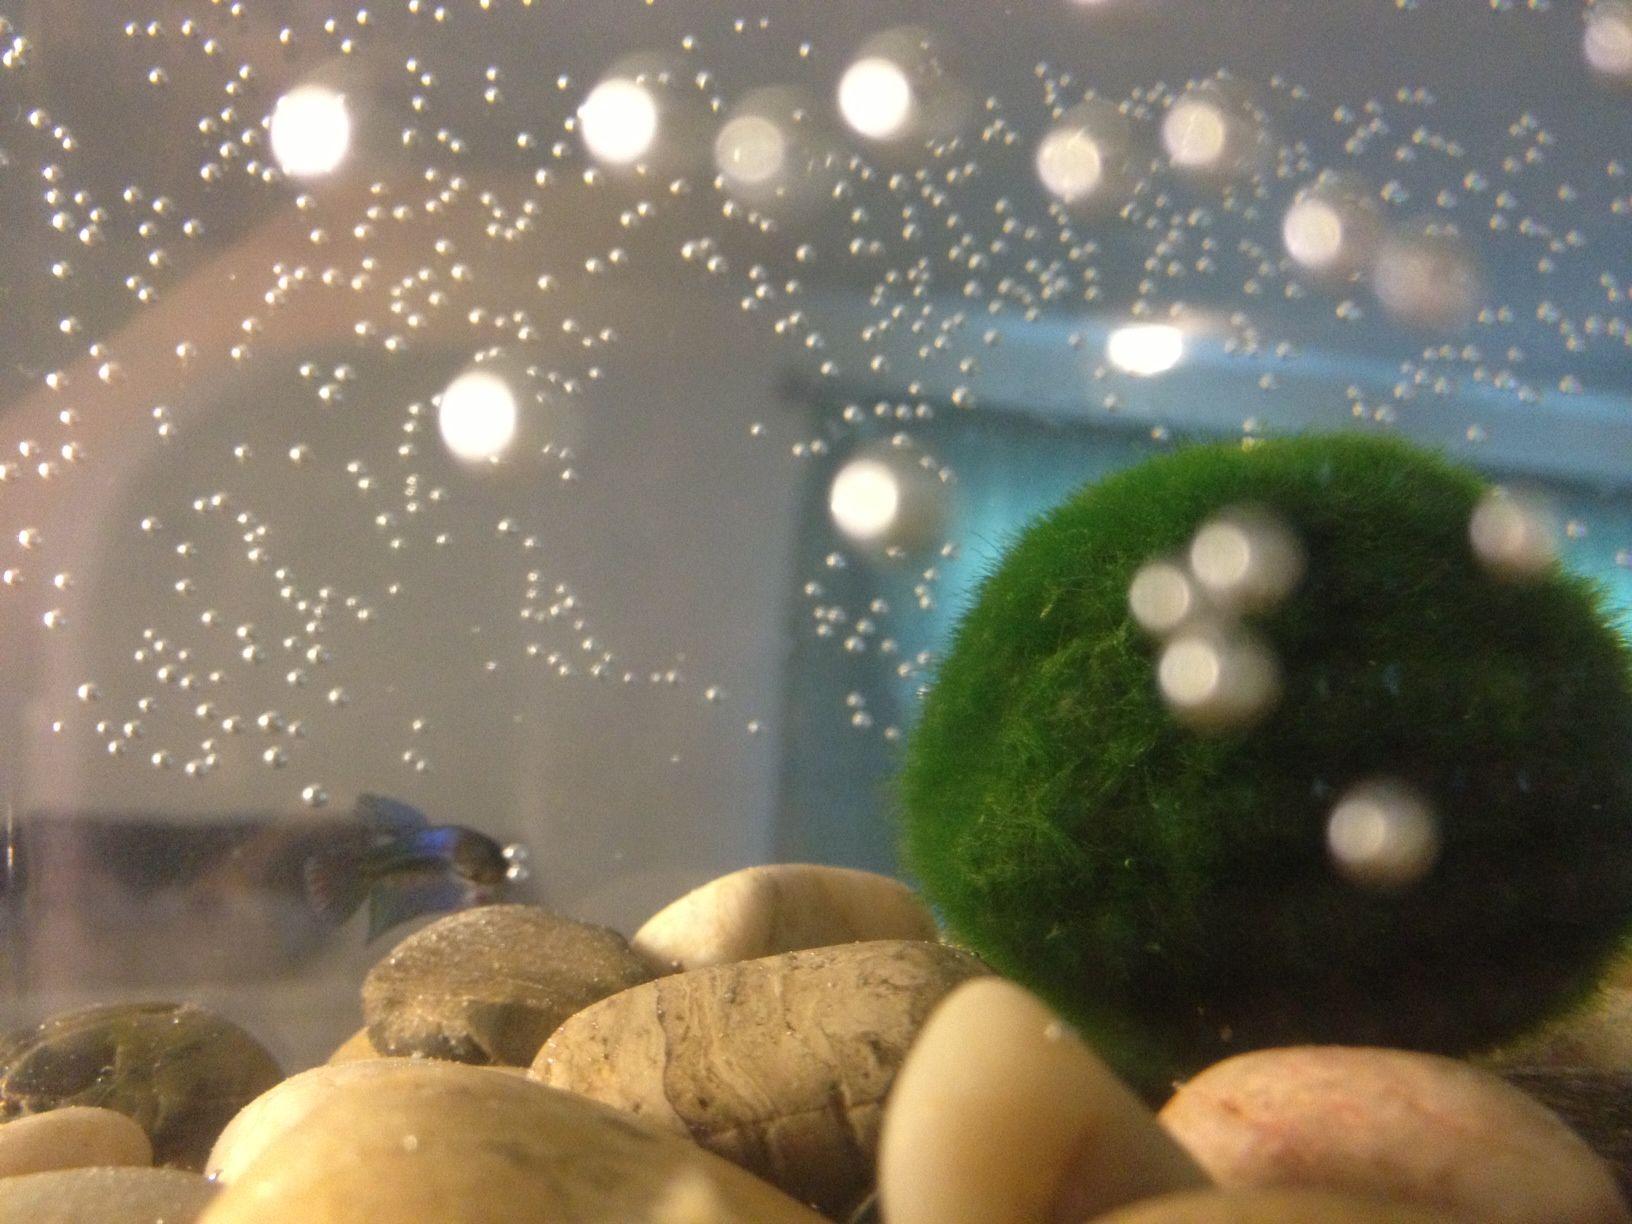 My new tank baby betta fish with marimo moss ball for Baby betta fish